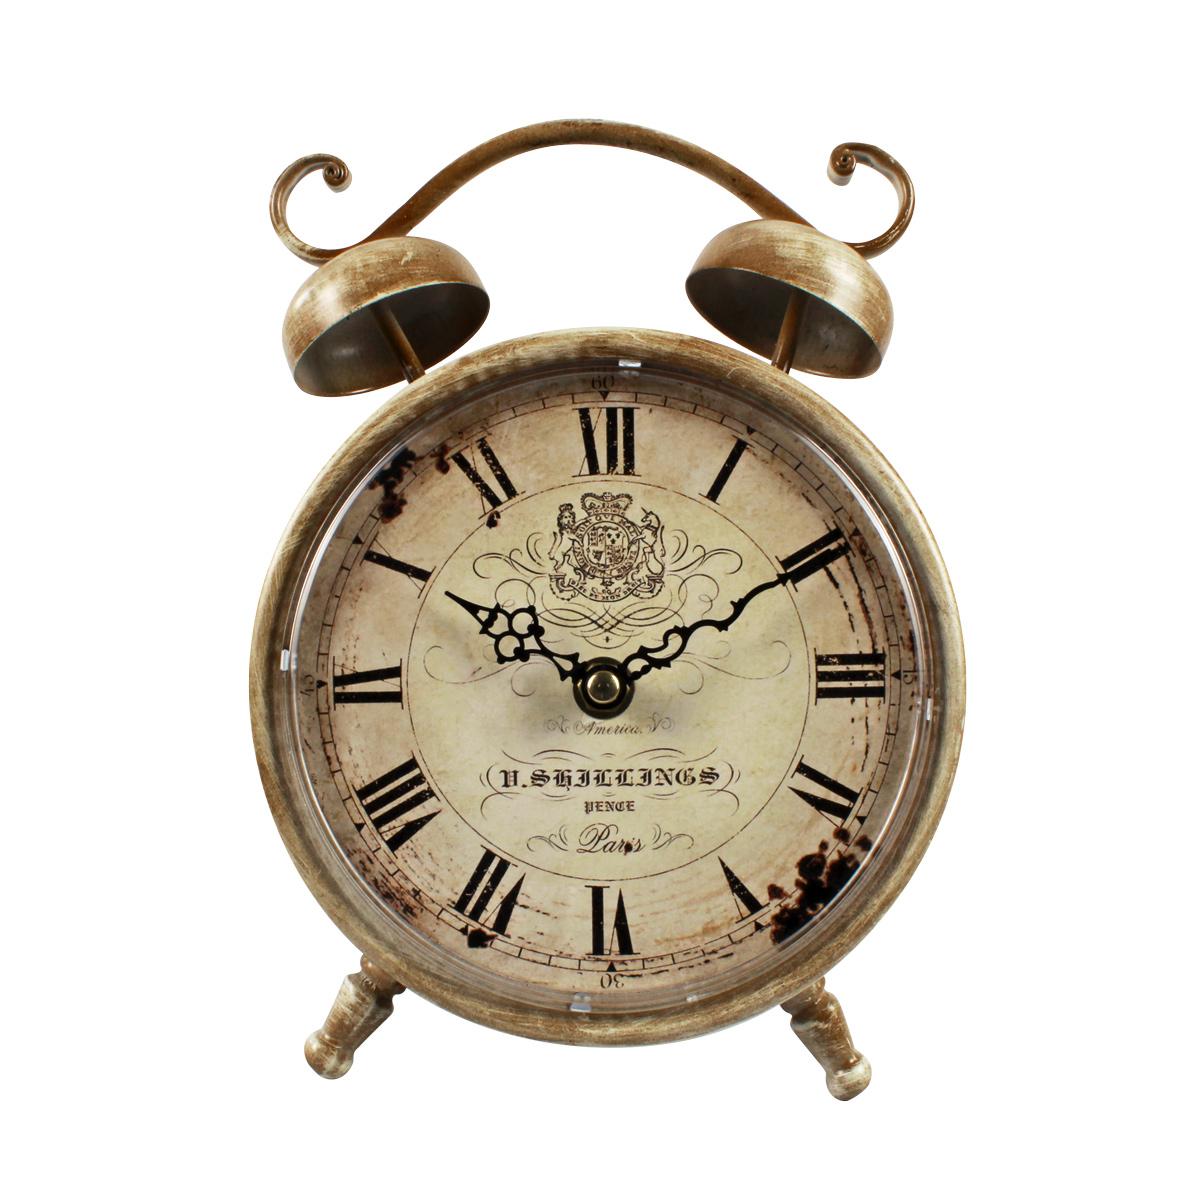 Relógio De Mesa De Metal V. Shillings Pence Paris